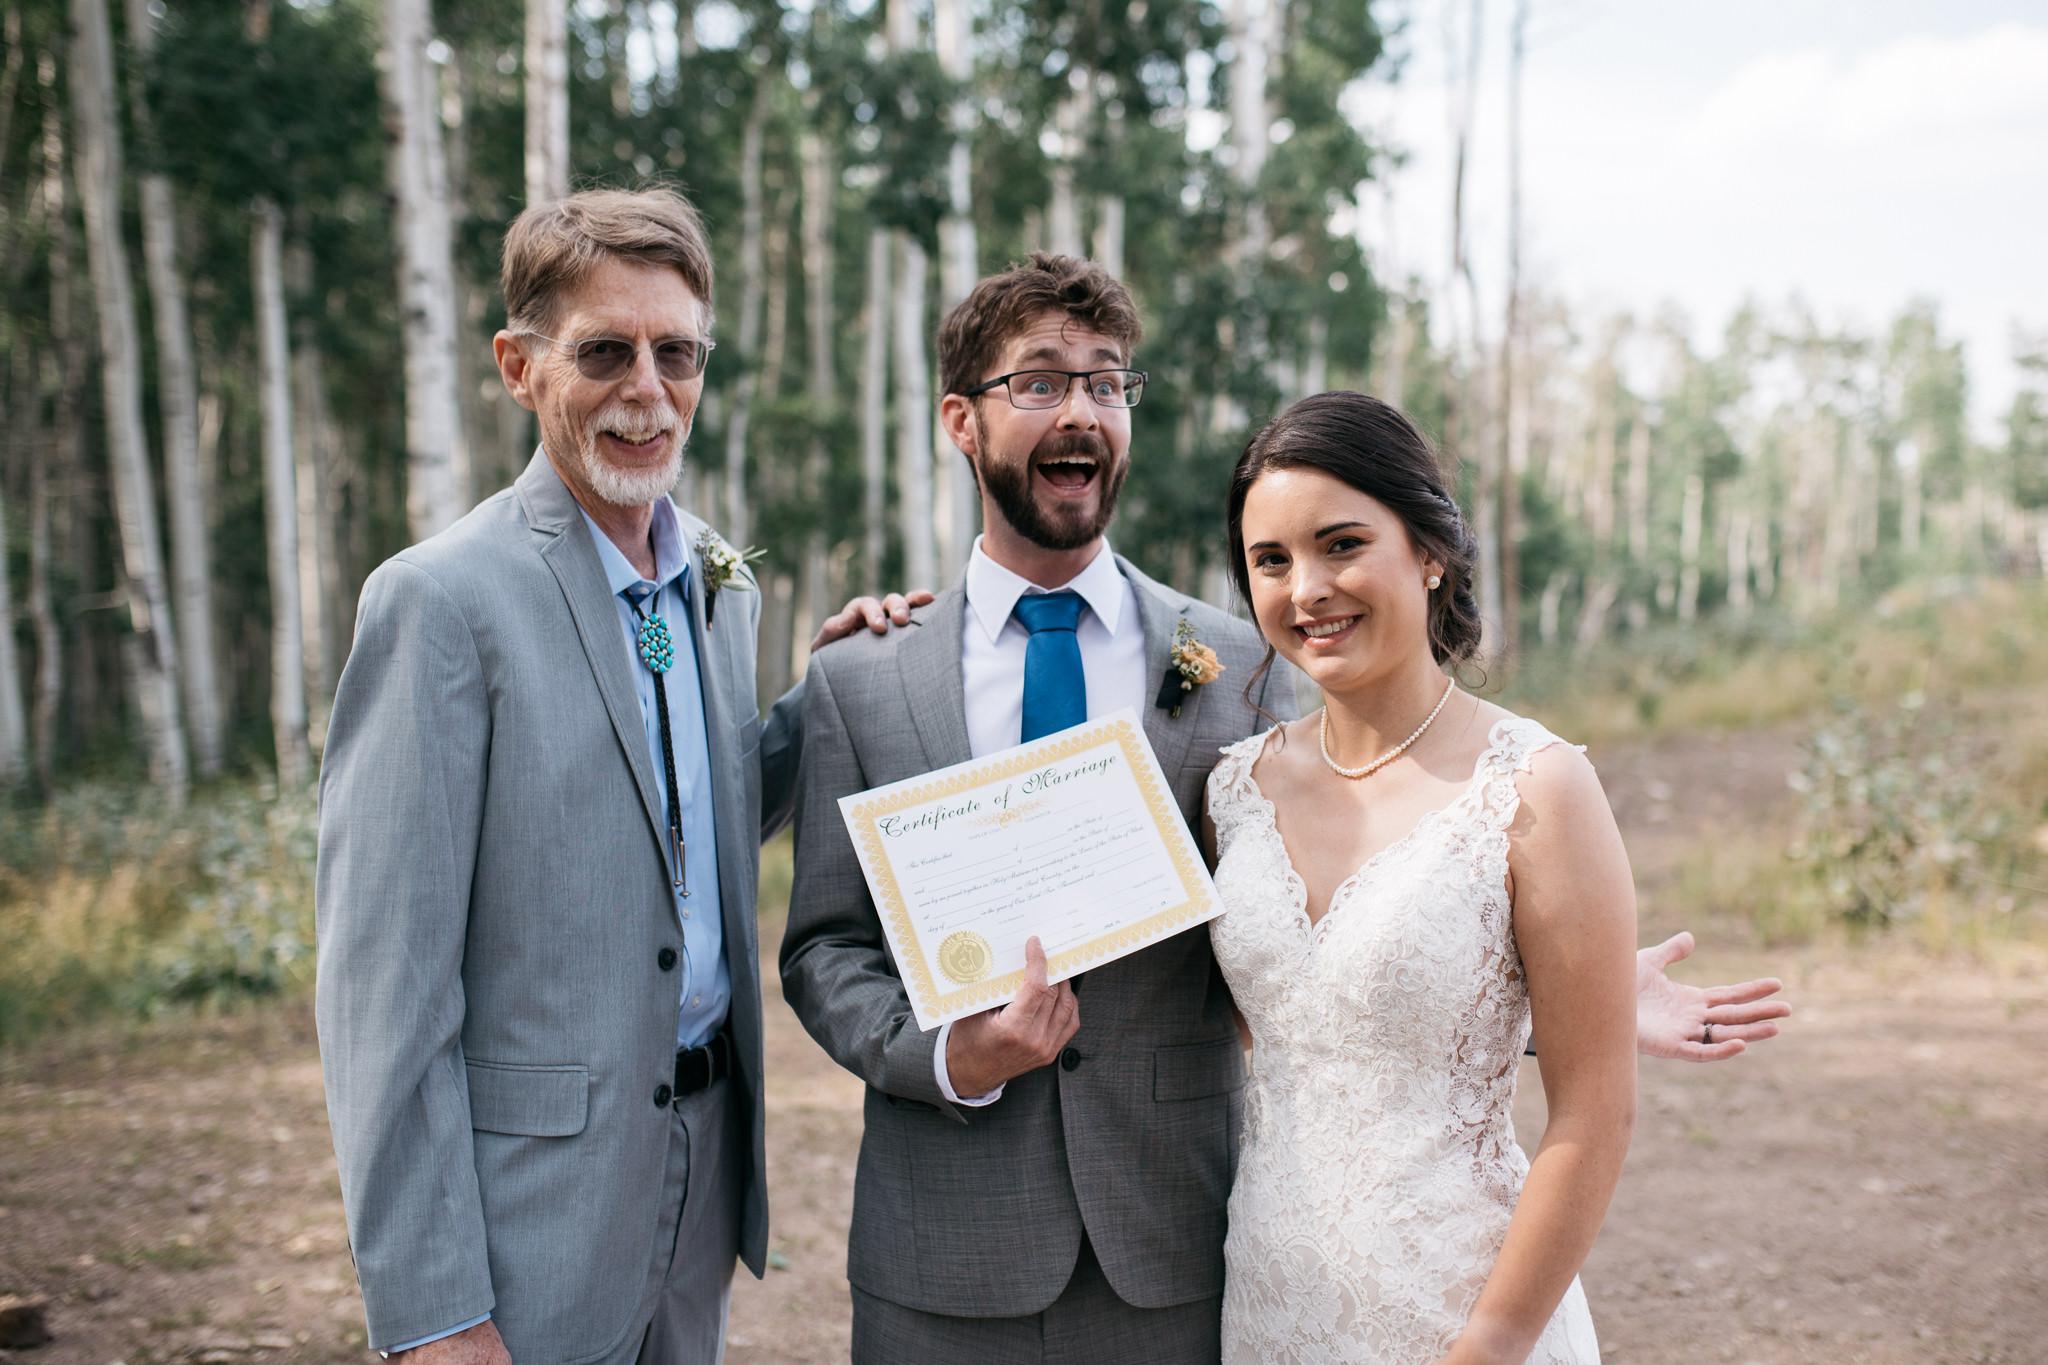 298_ONL_Kat_Nick_Wedding_Trevor_Hooper_Photo.jpg